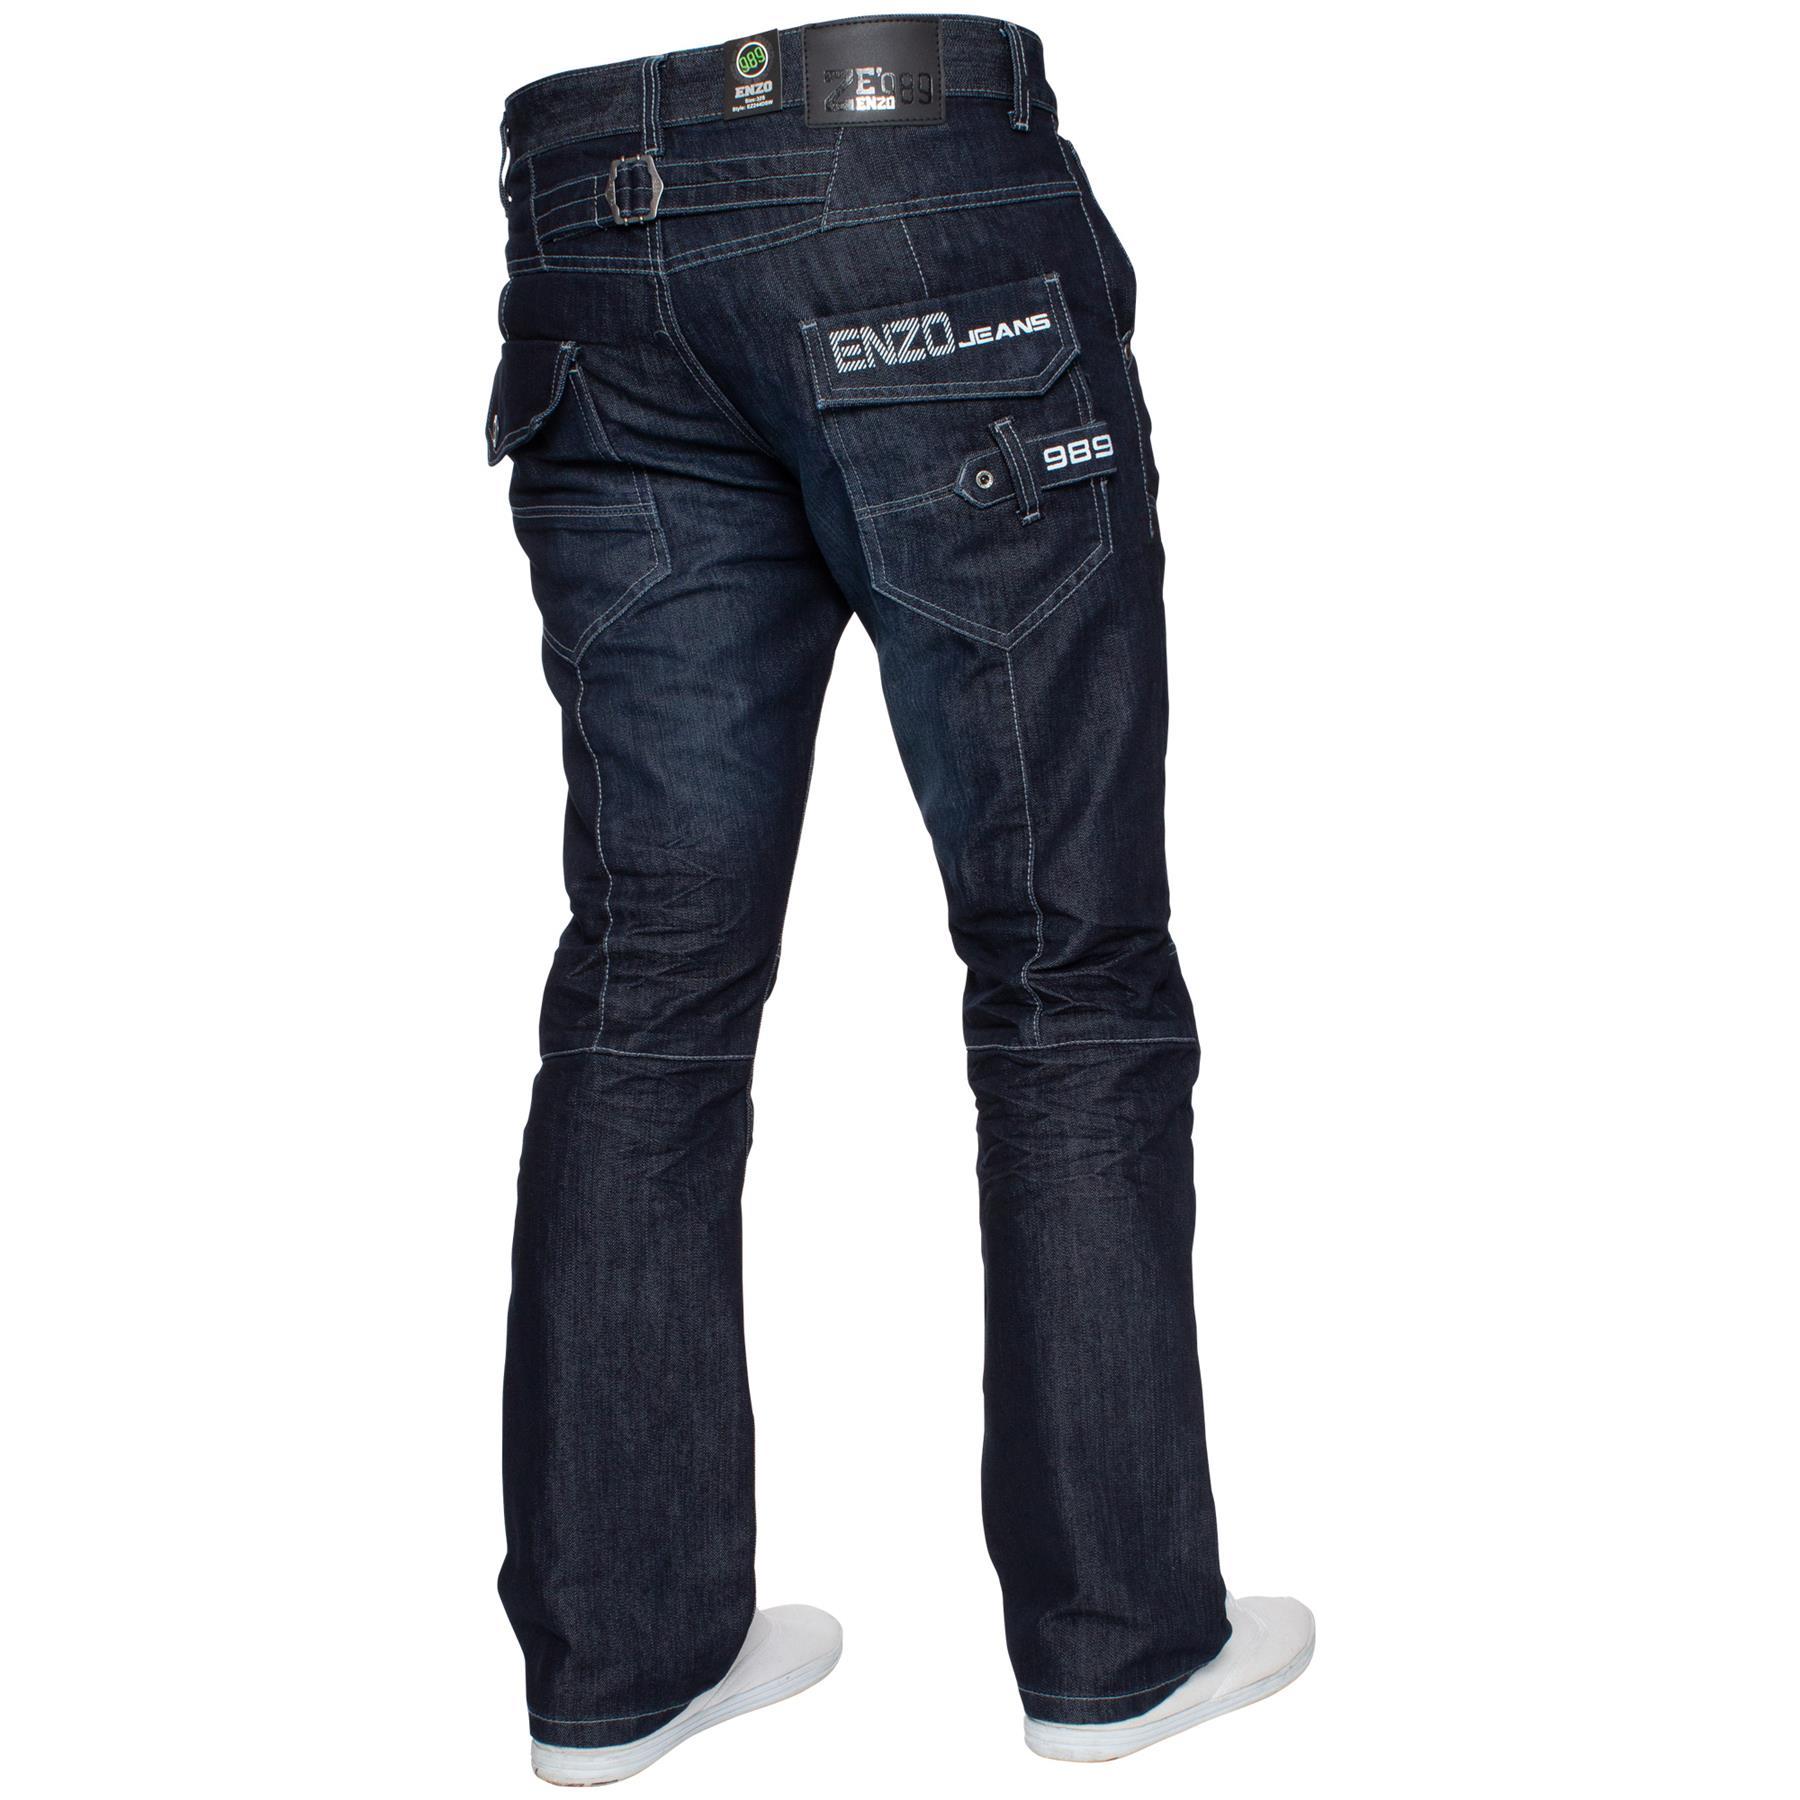 Enzo-Mens-Big-Tall-Jeans-Leg-King-Size-Denim-Pants-Chino-Trousers-Pants-44-034-60-034 thumbnail 72